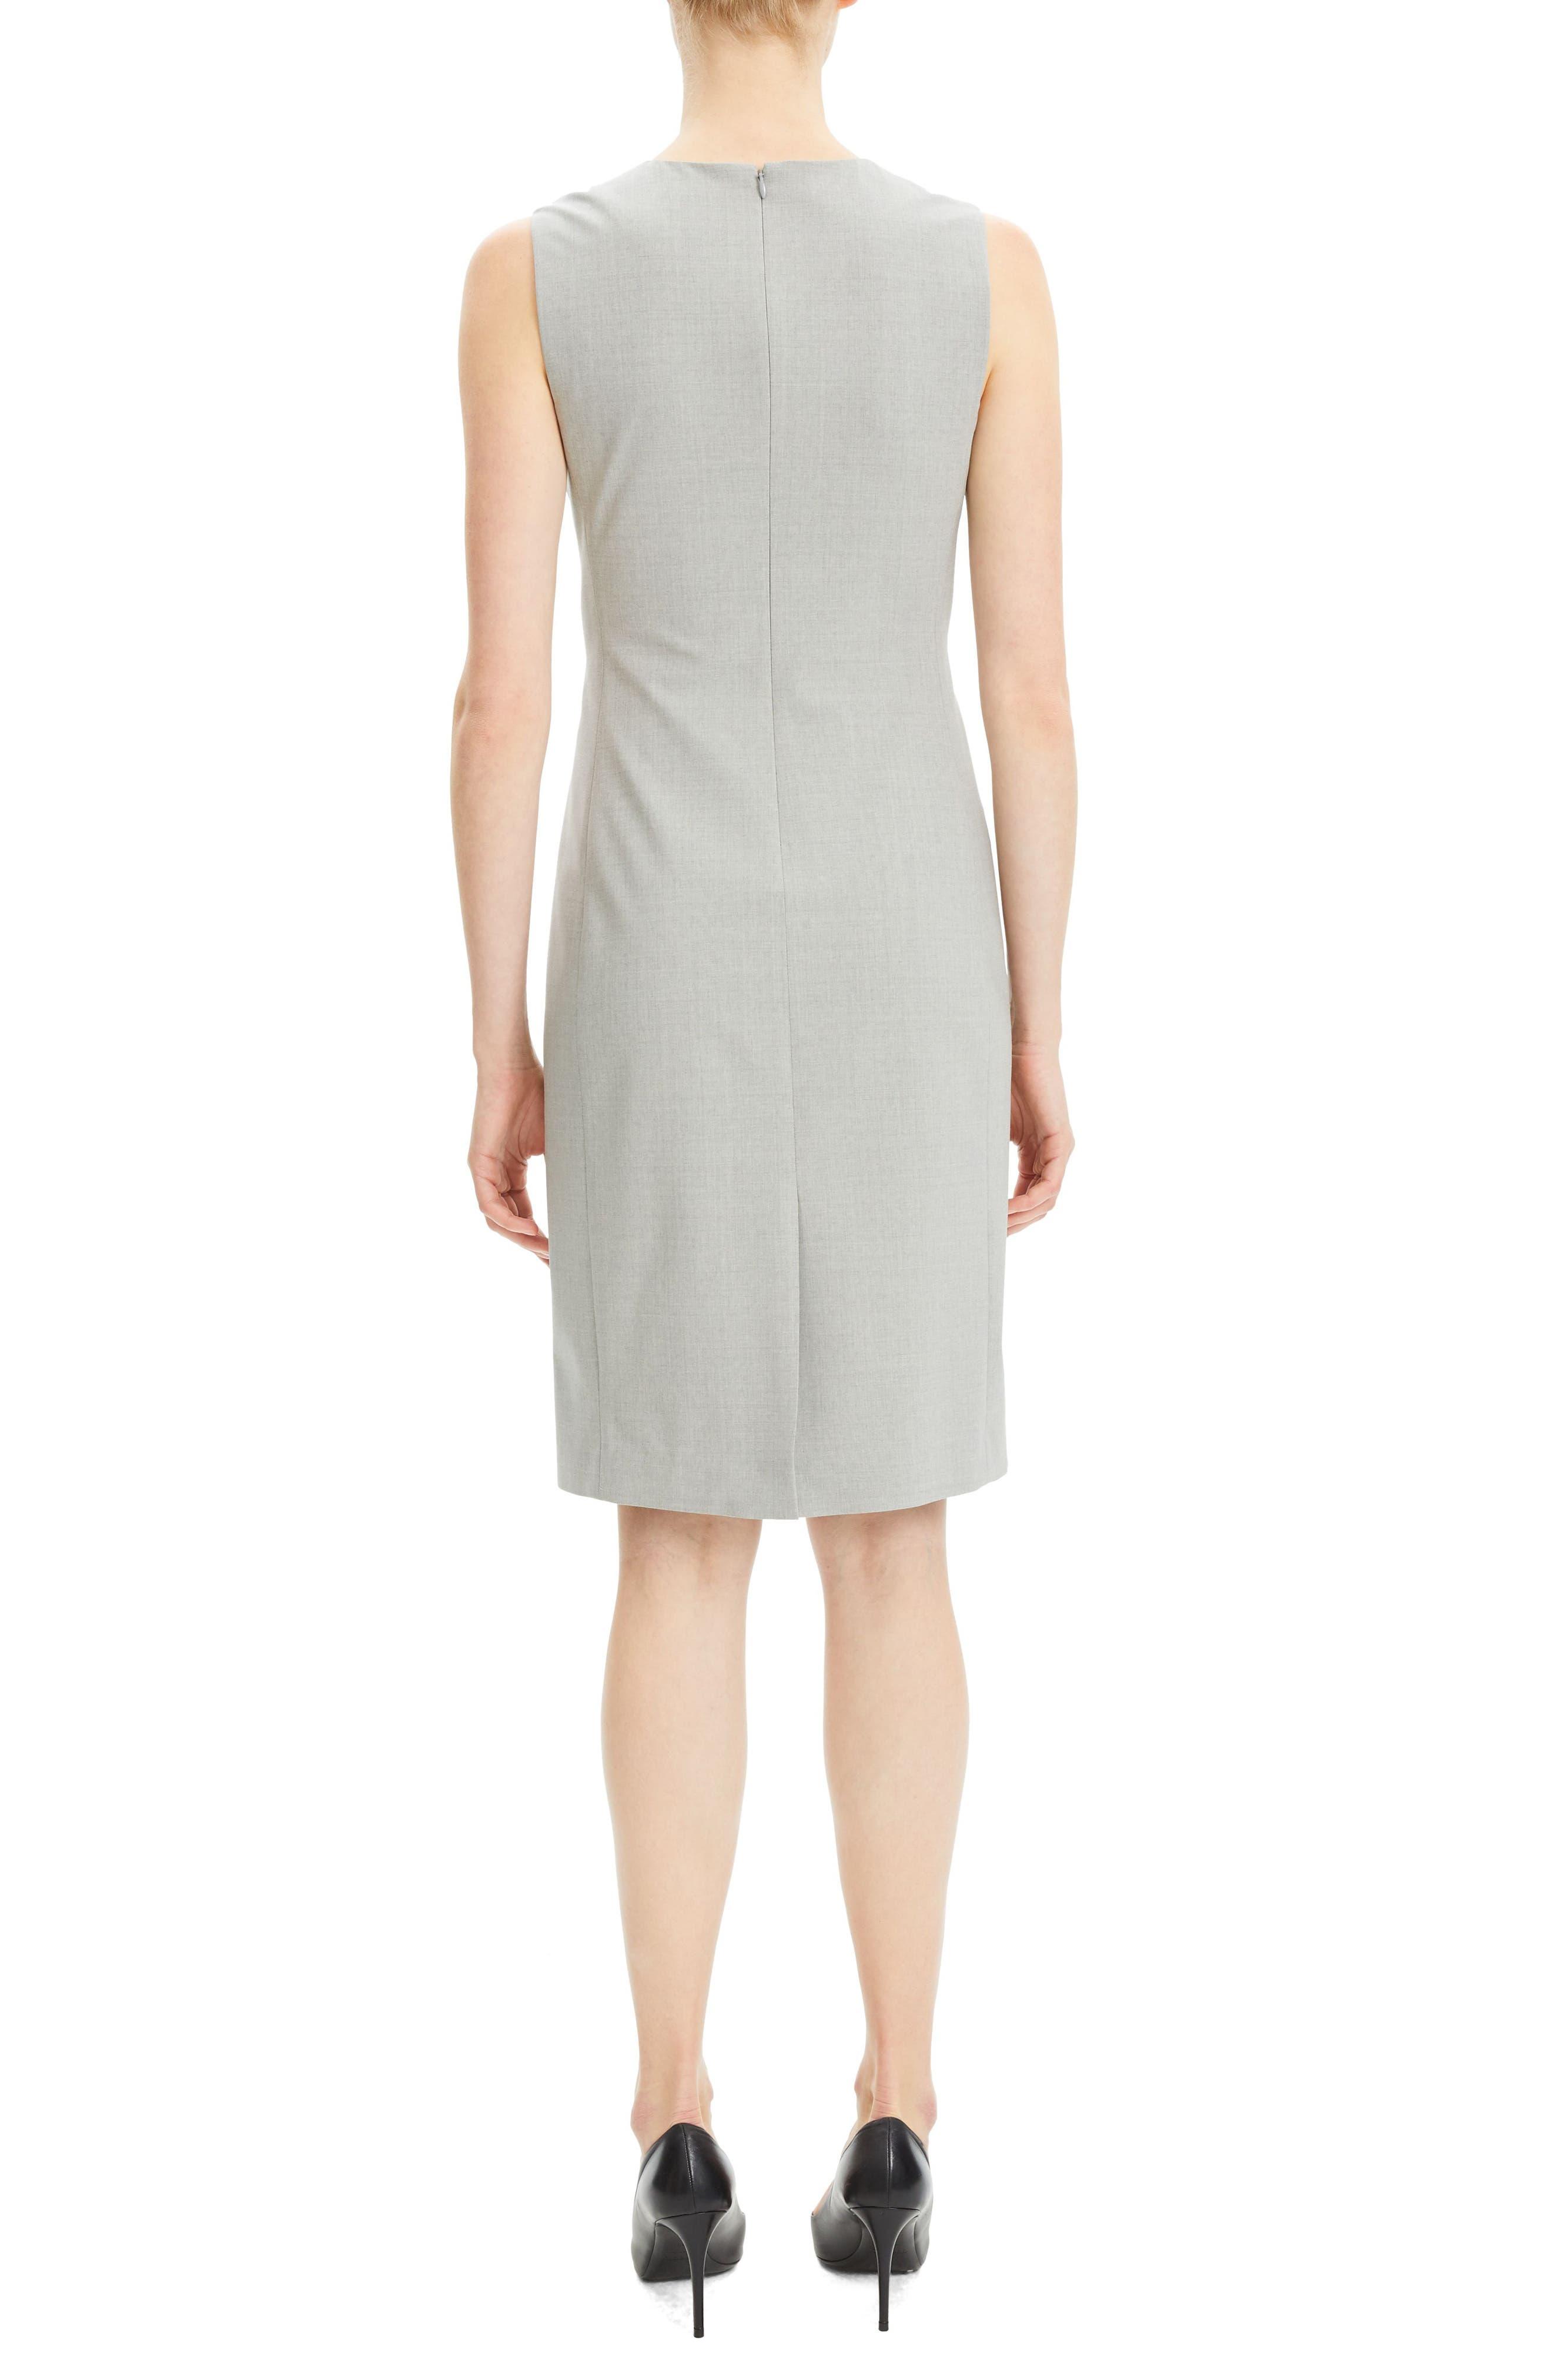 THEORY,                             Eano Good Wool Sheath Dress,                             Alternate thumbnail 2, color,                             050